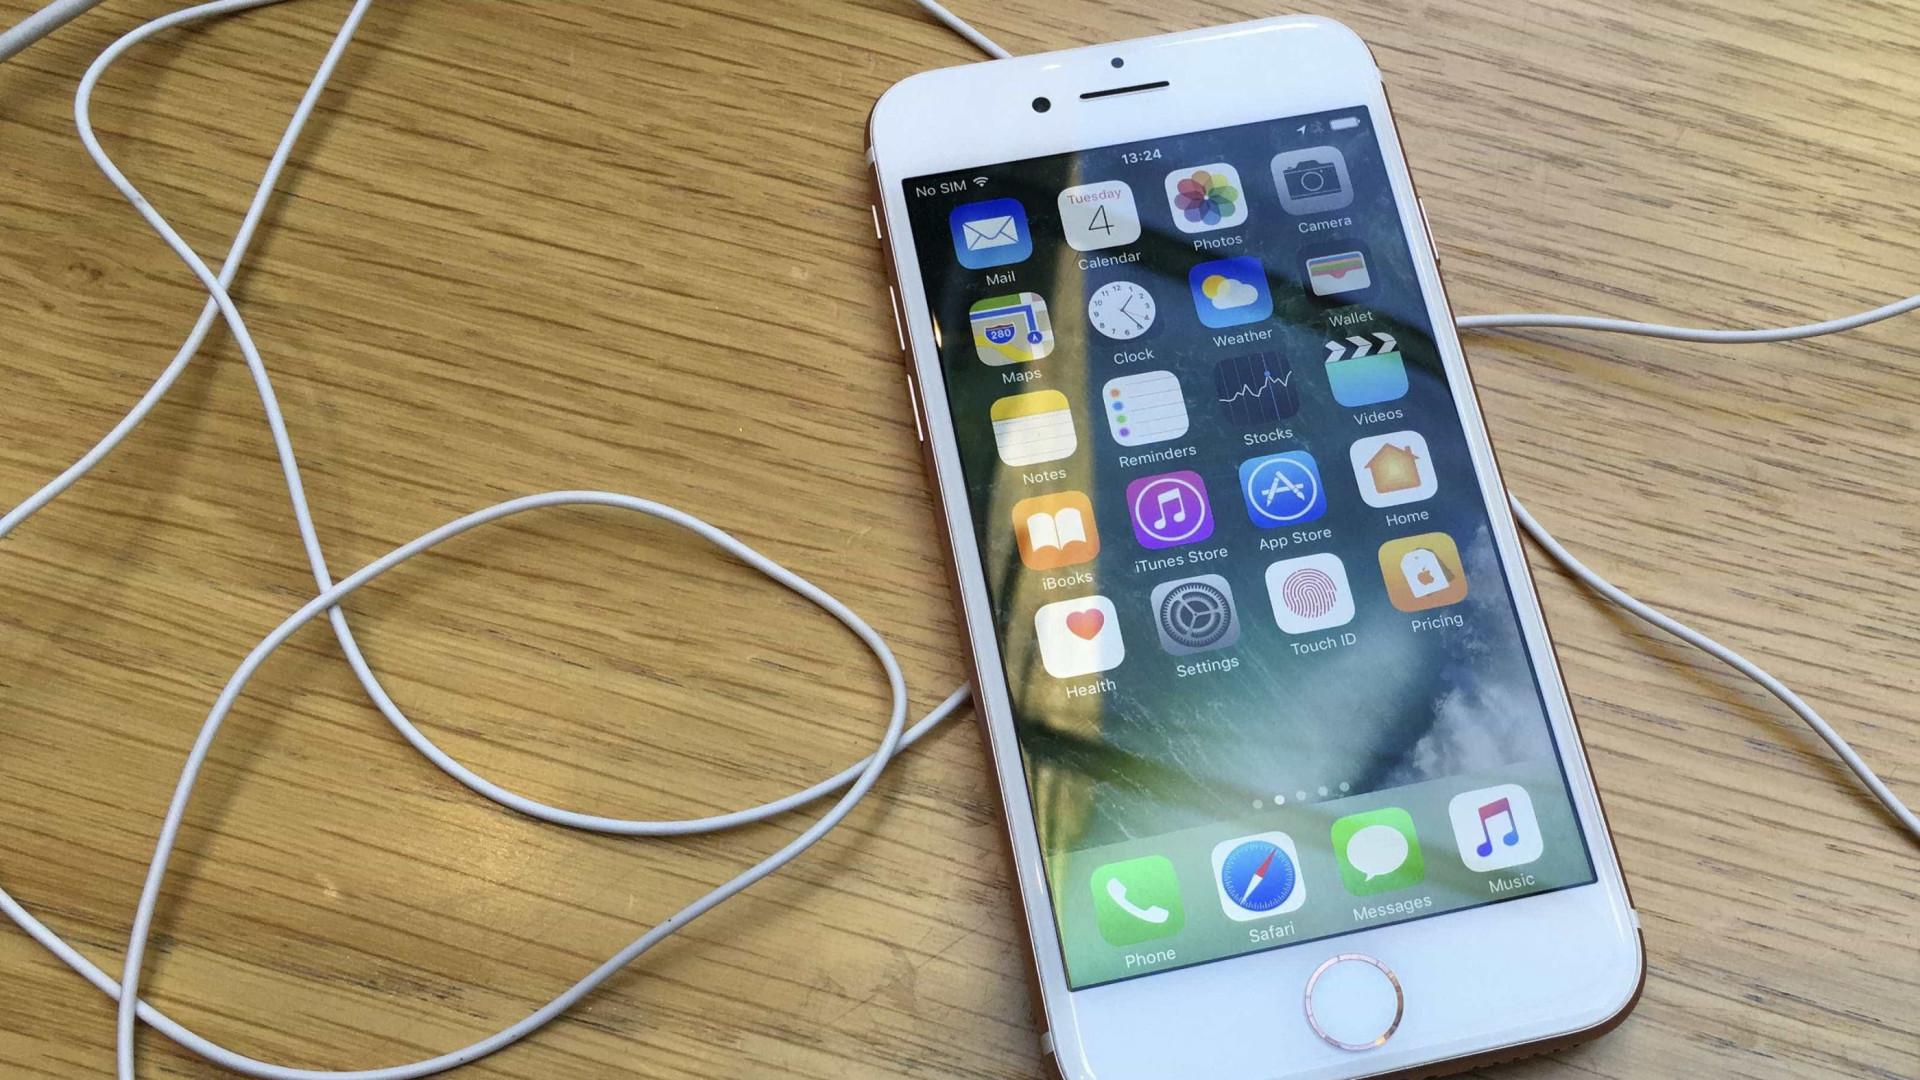 Se rumor se confirmar, o novo iPhone vai ser caro. Muito caro